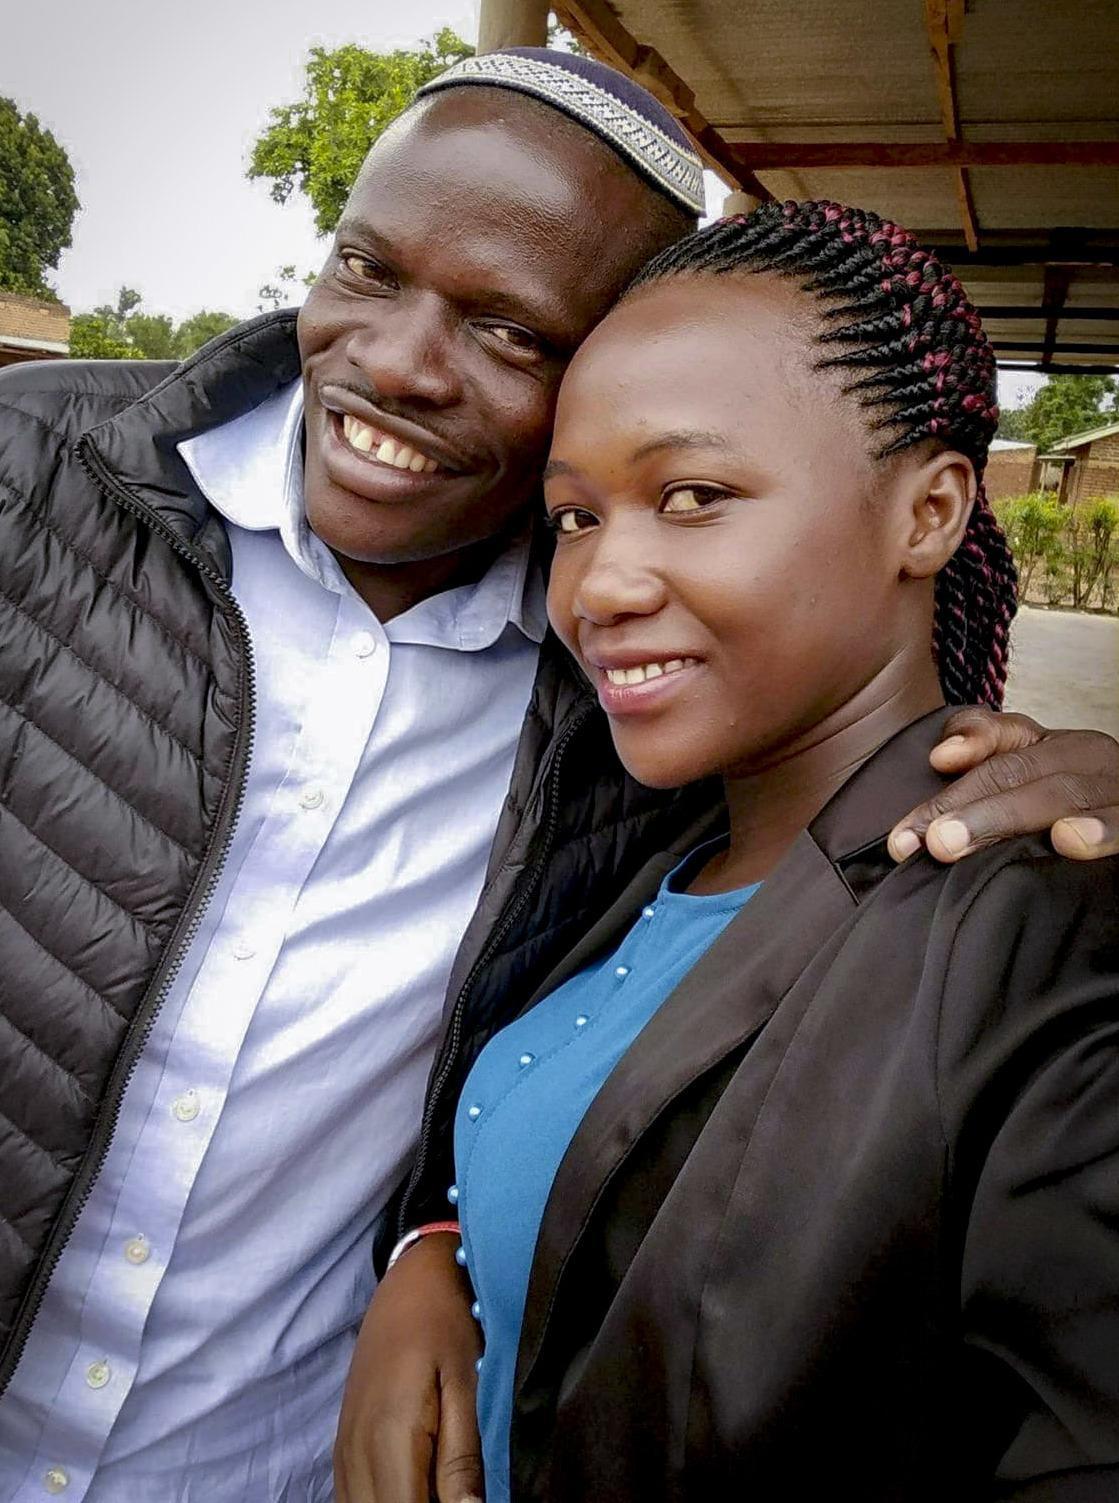 Shadrach Mugoya Levi and his wife, Naomi.